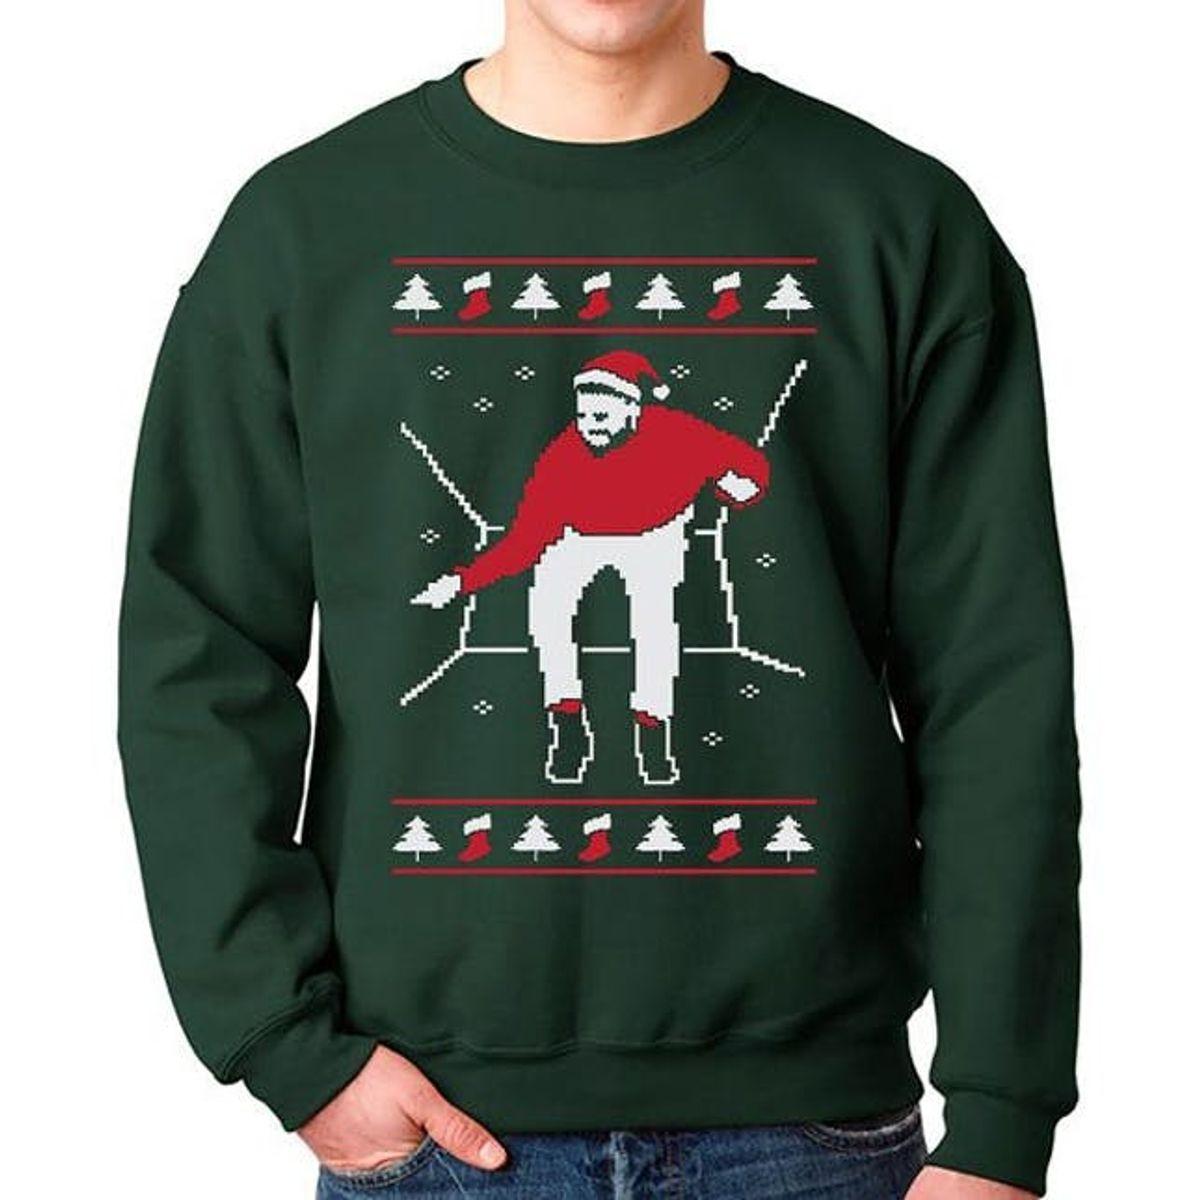 Happy Holla Days Funny Christmas Sweatshirt  Ugly Christmas Sweater Oversized 34 Sleeve Sweatshirt Holiday Sweatshirt Funny Christmas Shirt